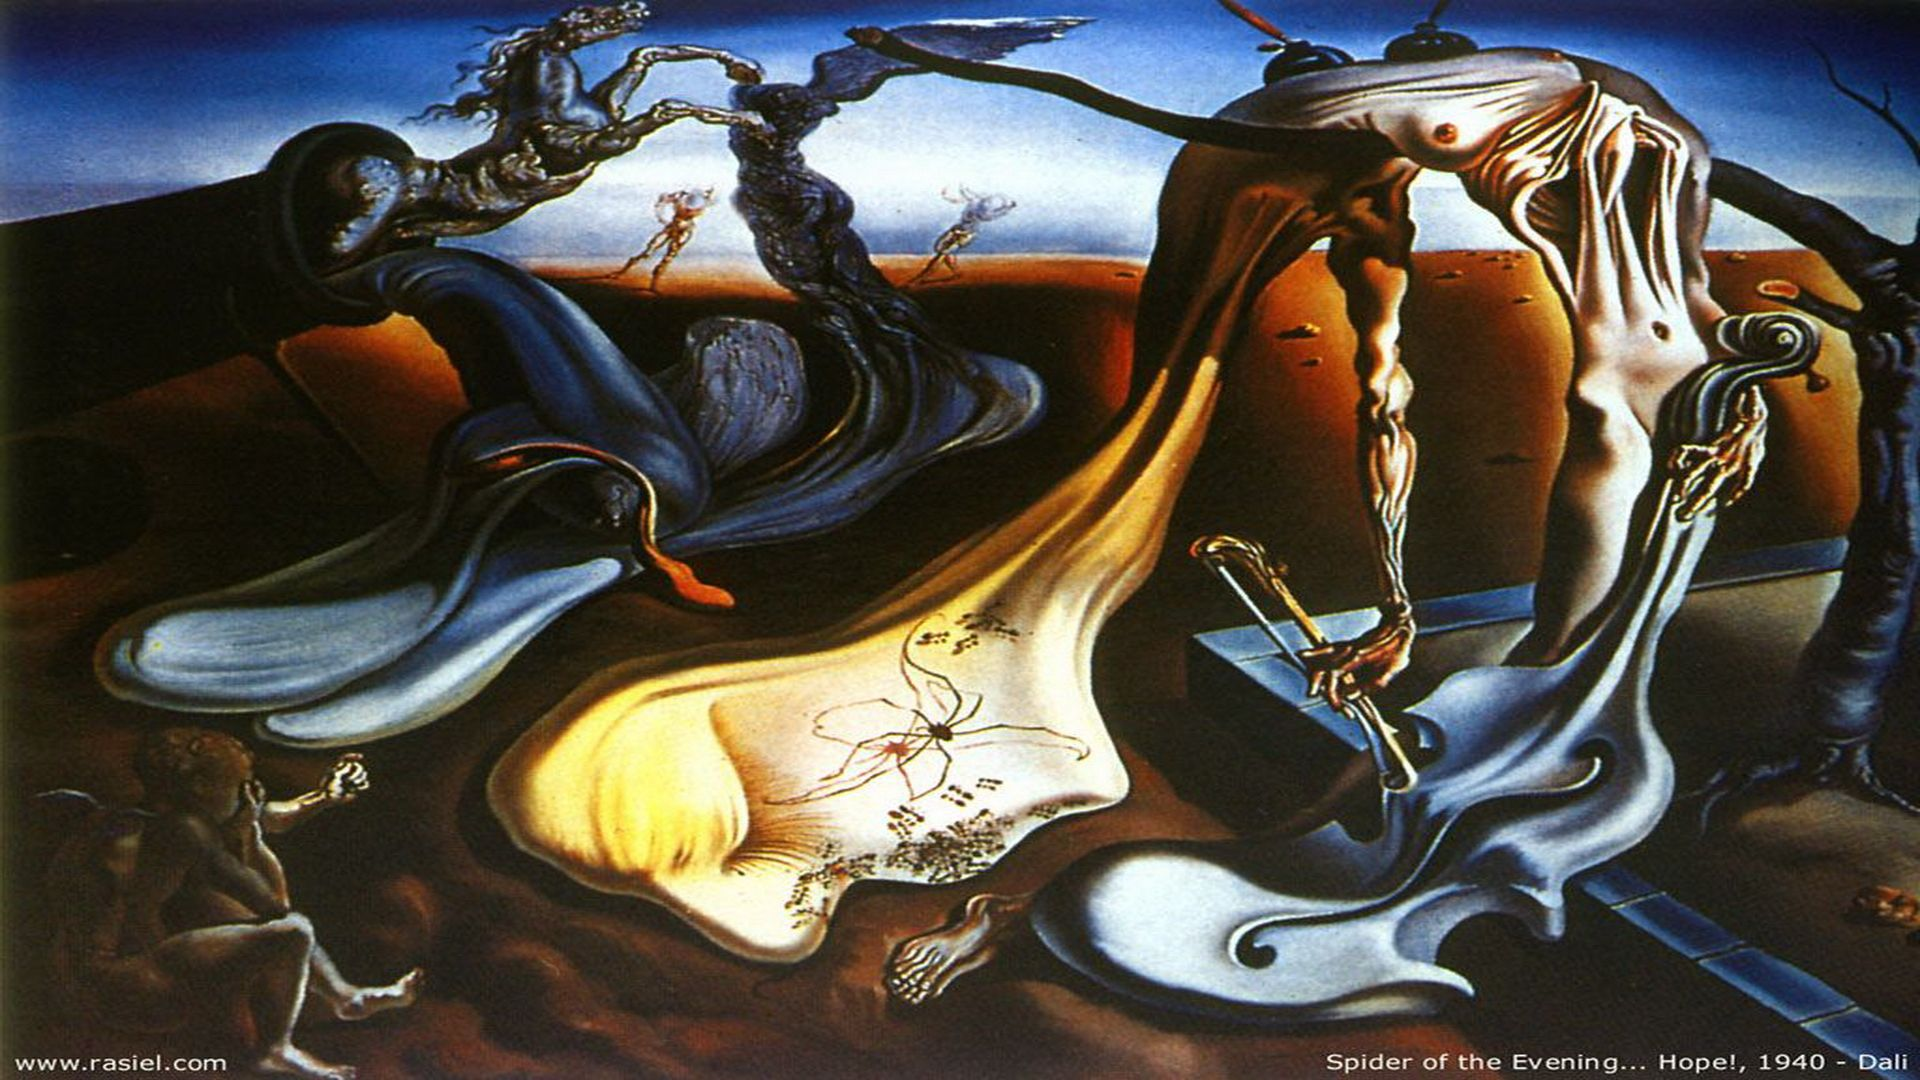 Salvador Dali Wallpapers Painting Art Wallpaper 1920x1080 Dali Paintings Salvador Dali Salvador Dali Art